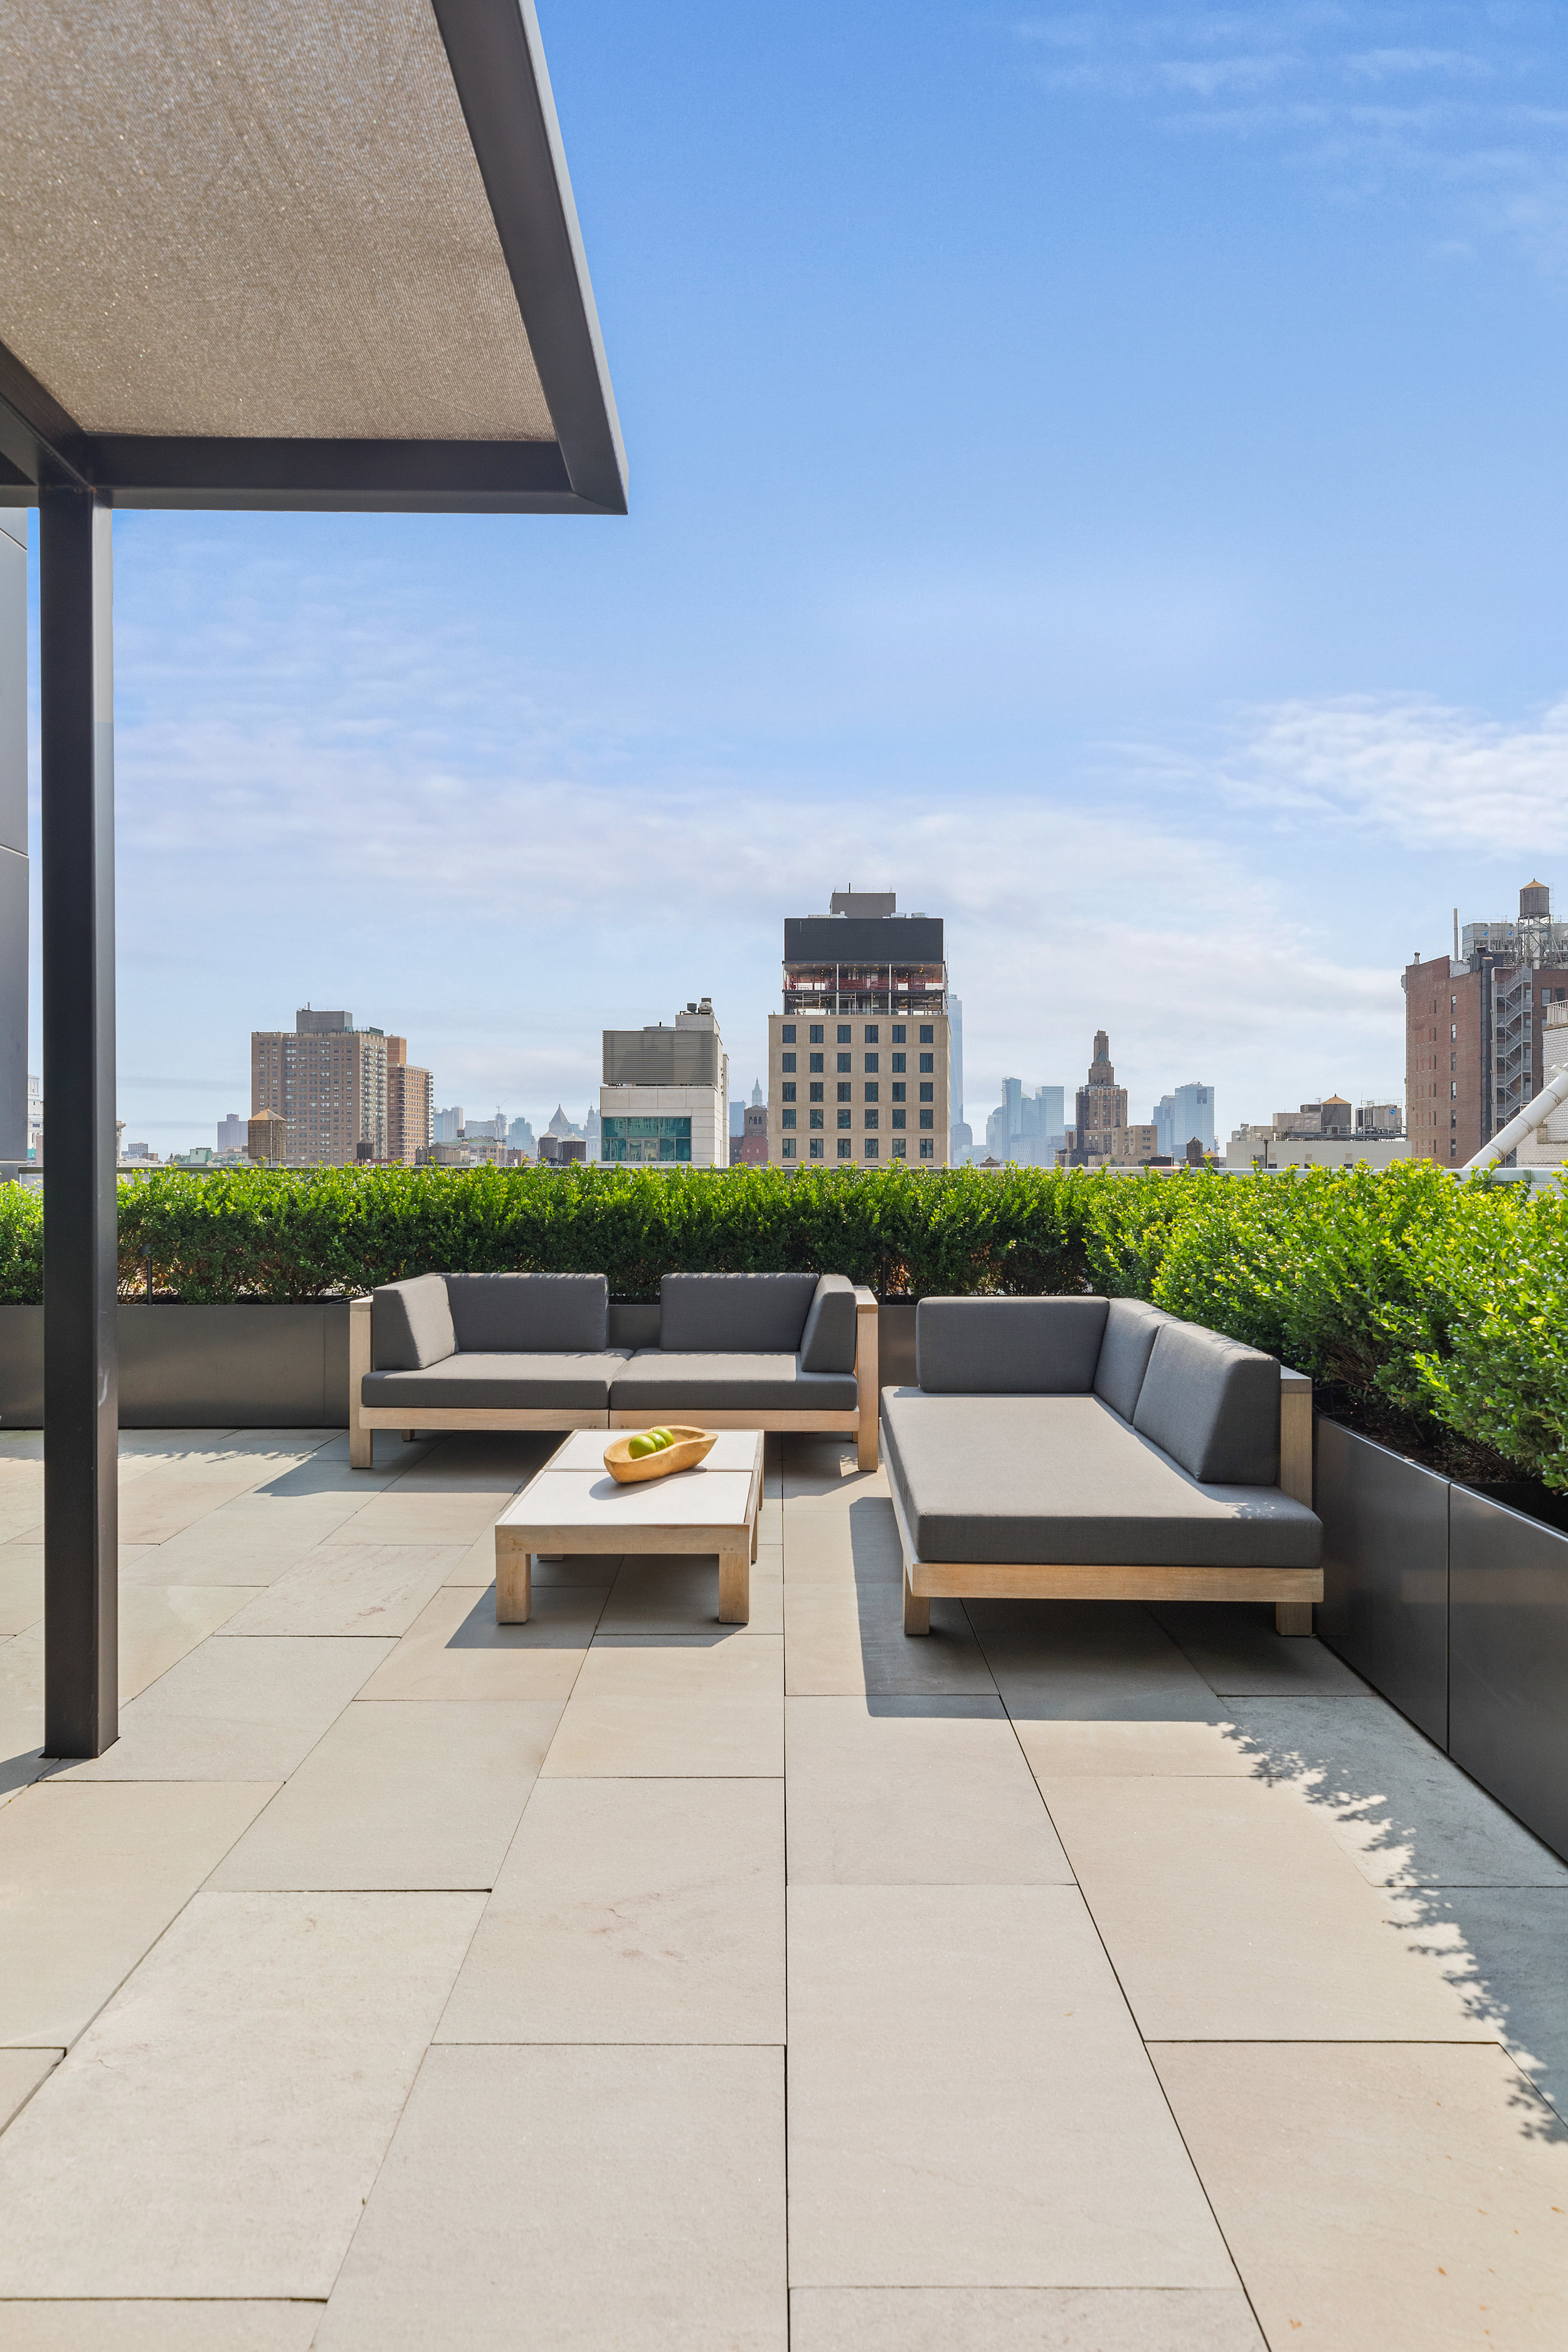 15 Union Square W New York NY - Josh Goetz Photography -8.JPG